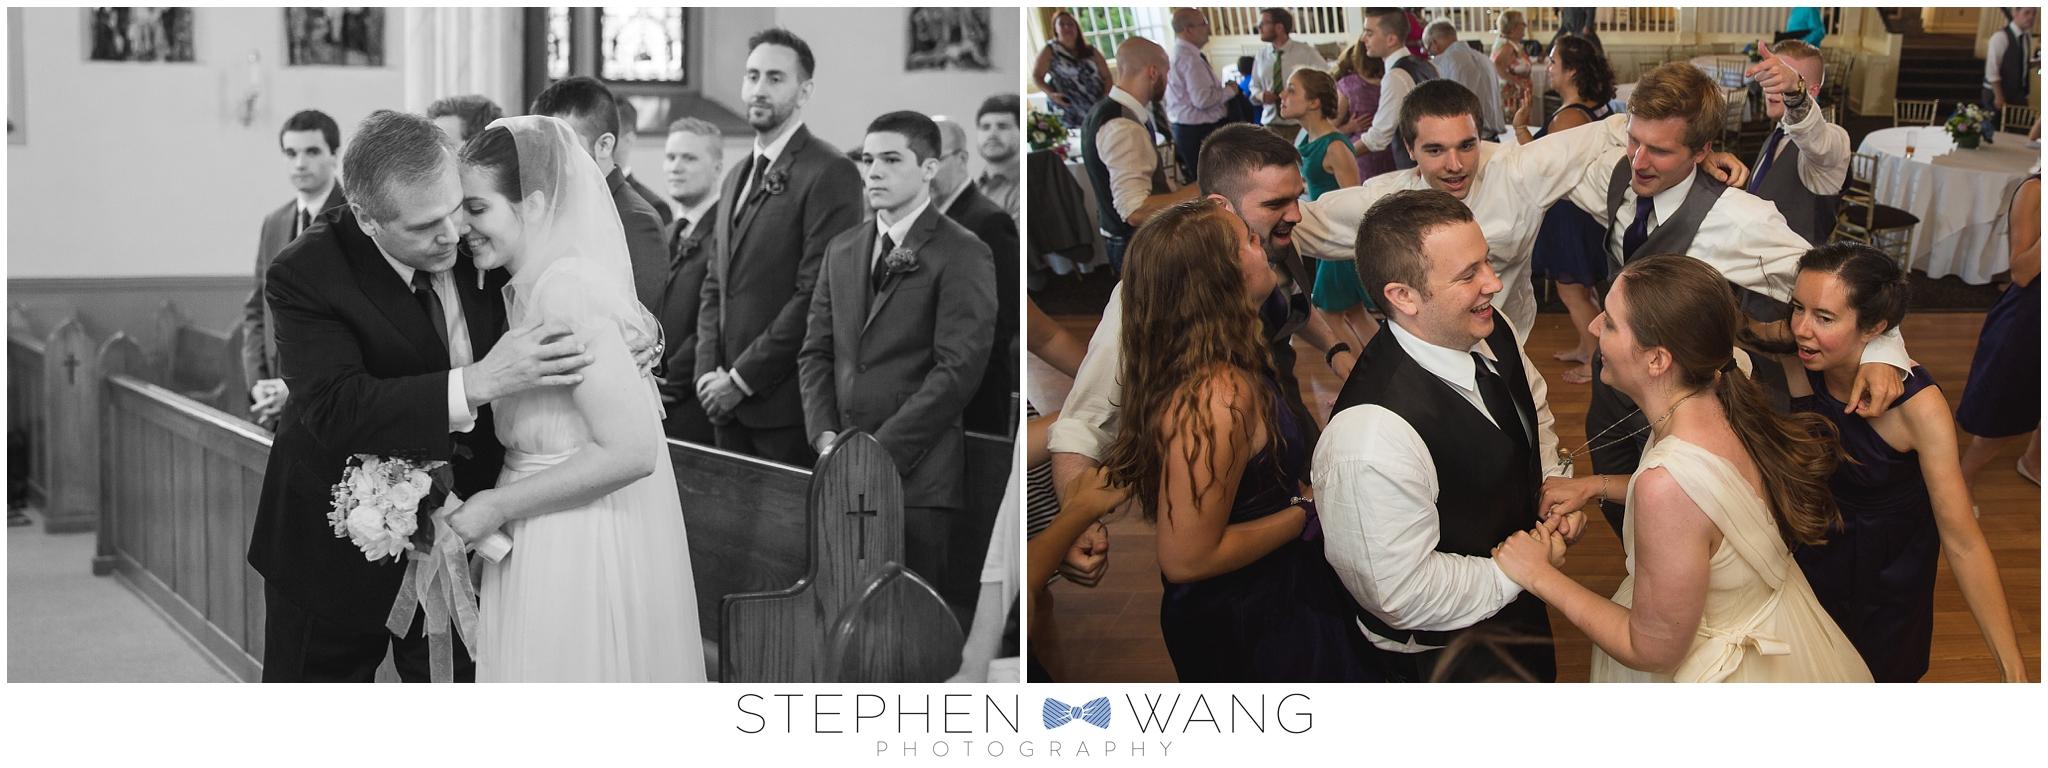 Stephen Wang Photography Wedding Photographer Connecticut CT-12-24_0019.jpg